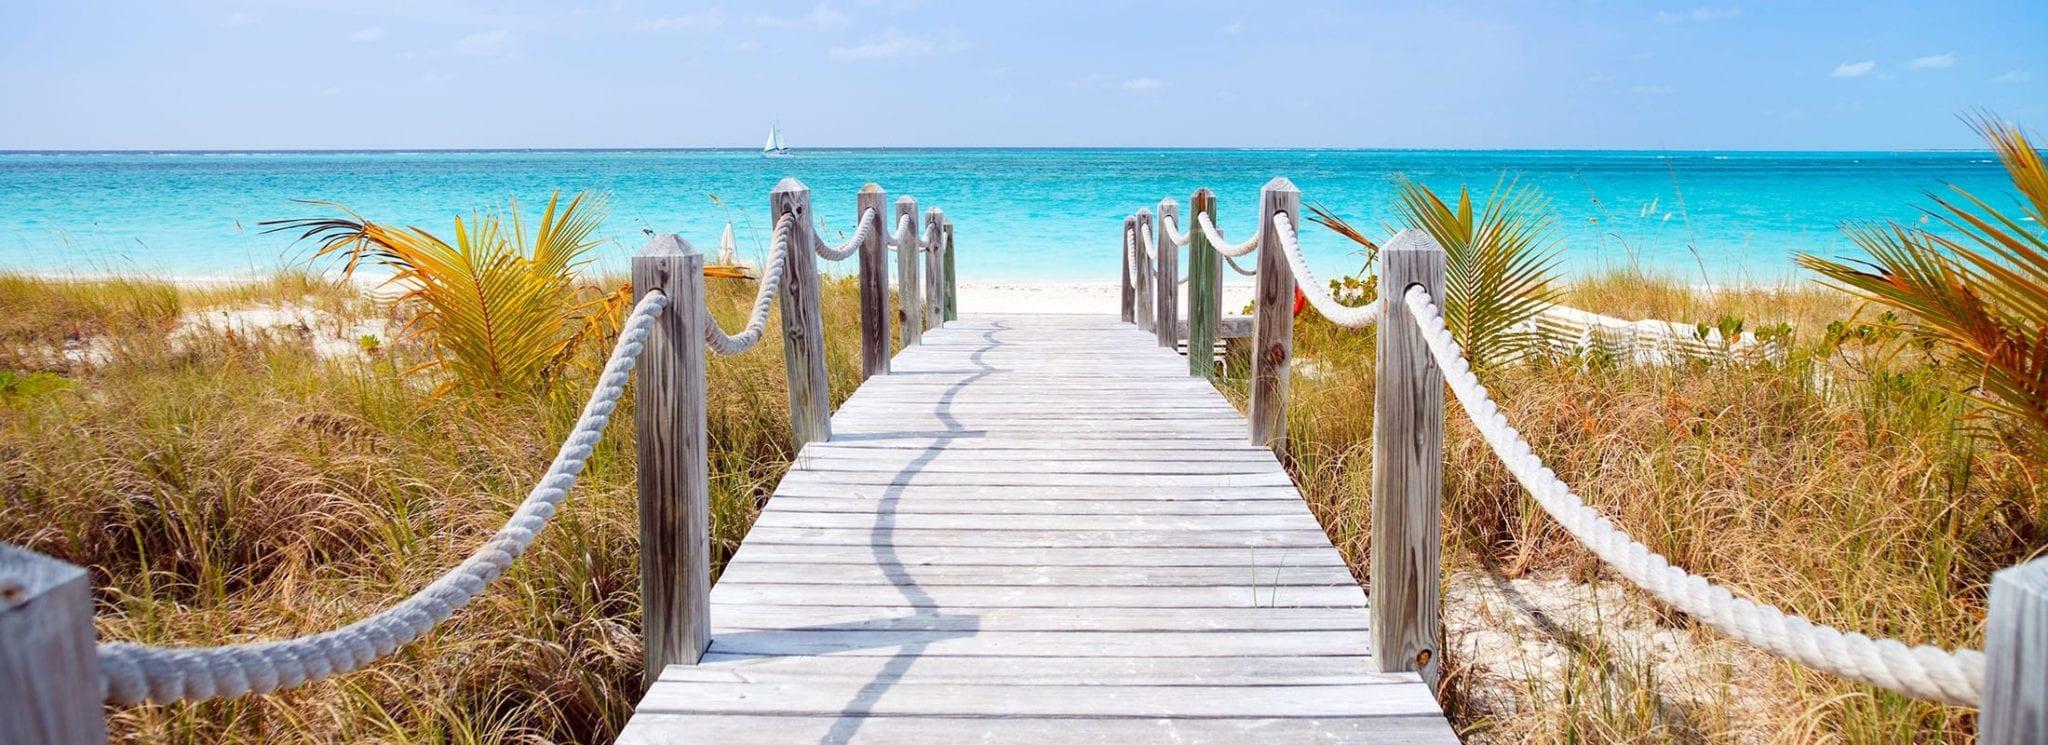 Turks And Caicos Weddings All Inclusive Beach Resorts